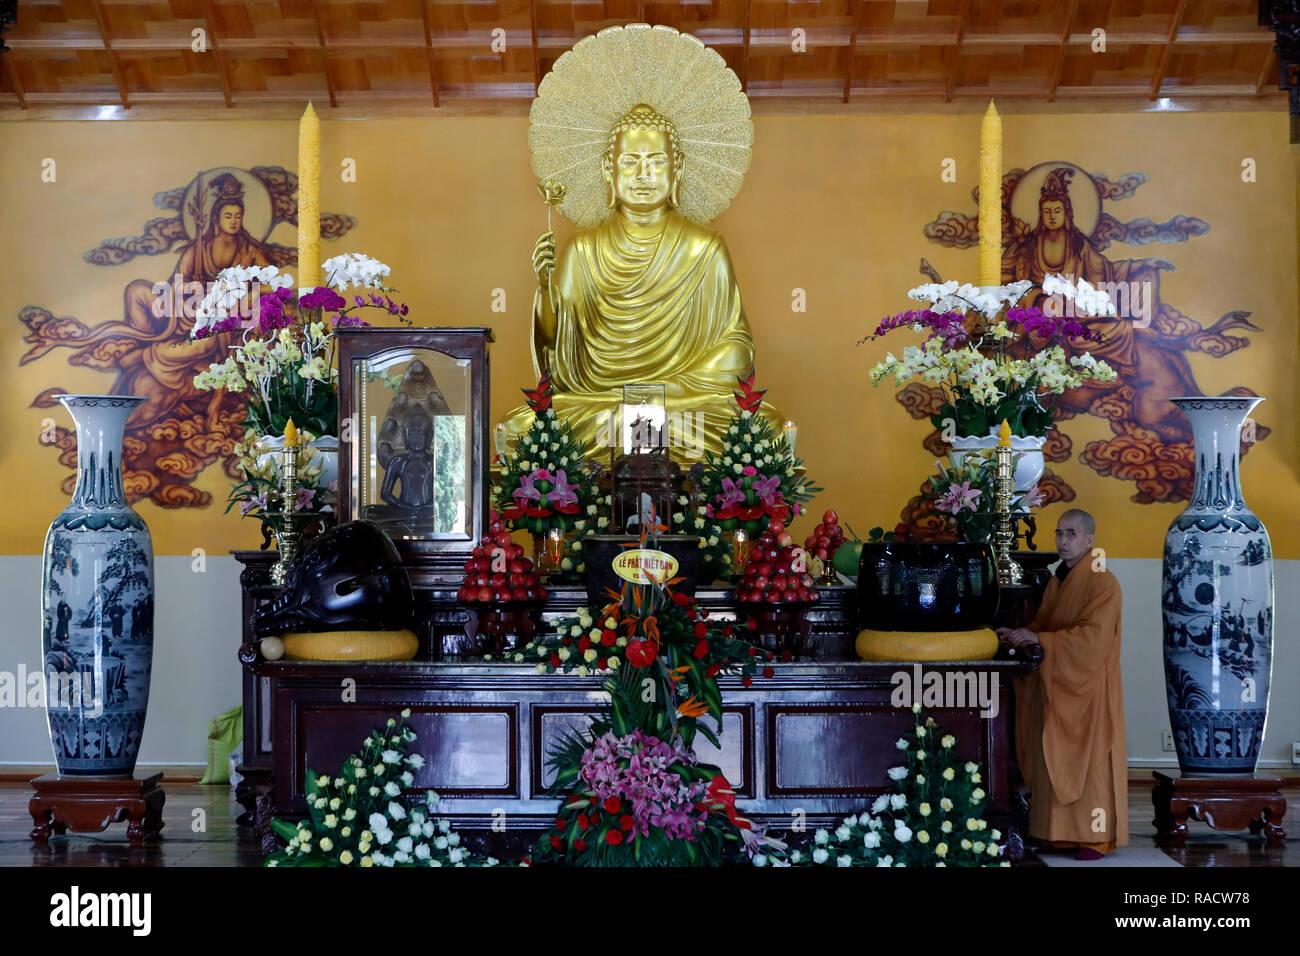 Main altar with Buddha statue and monk, Truc Lam Buddhist temple, Dalat, Vietnam, Indochina, Southeast Asia, Asia Stock Photo